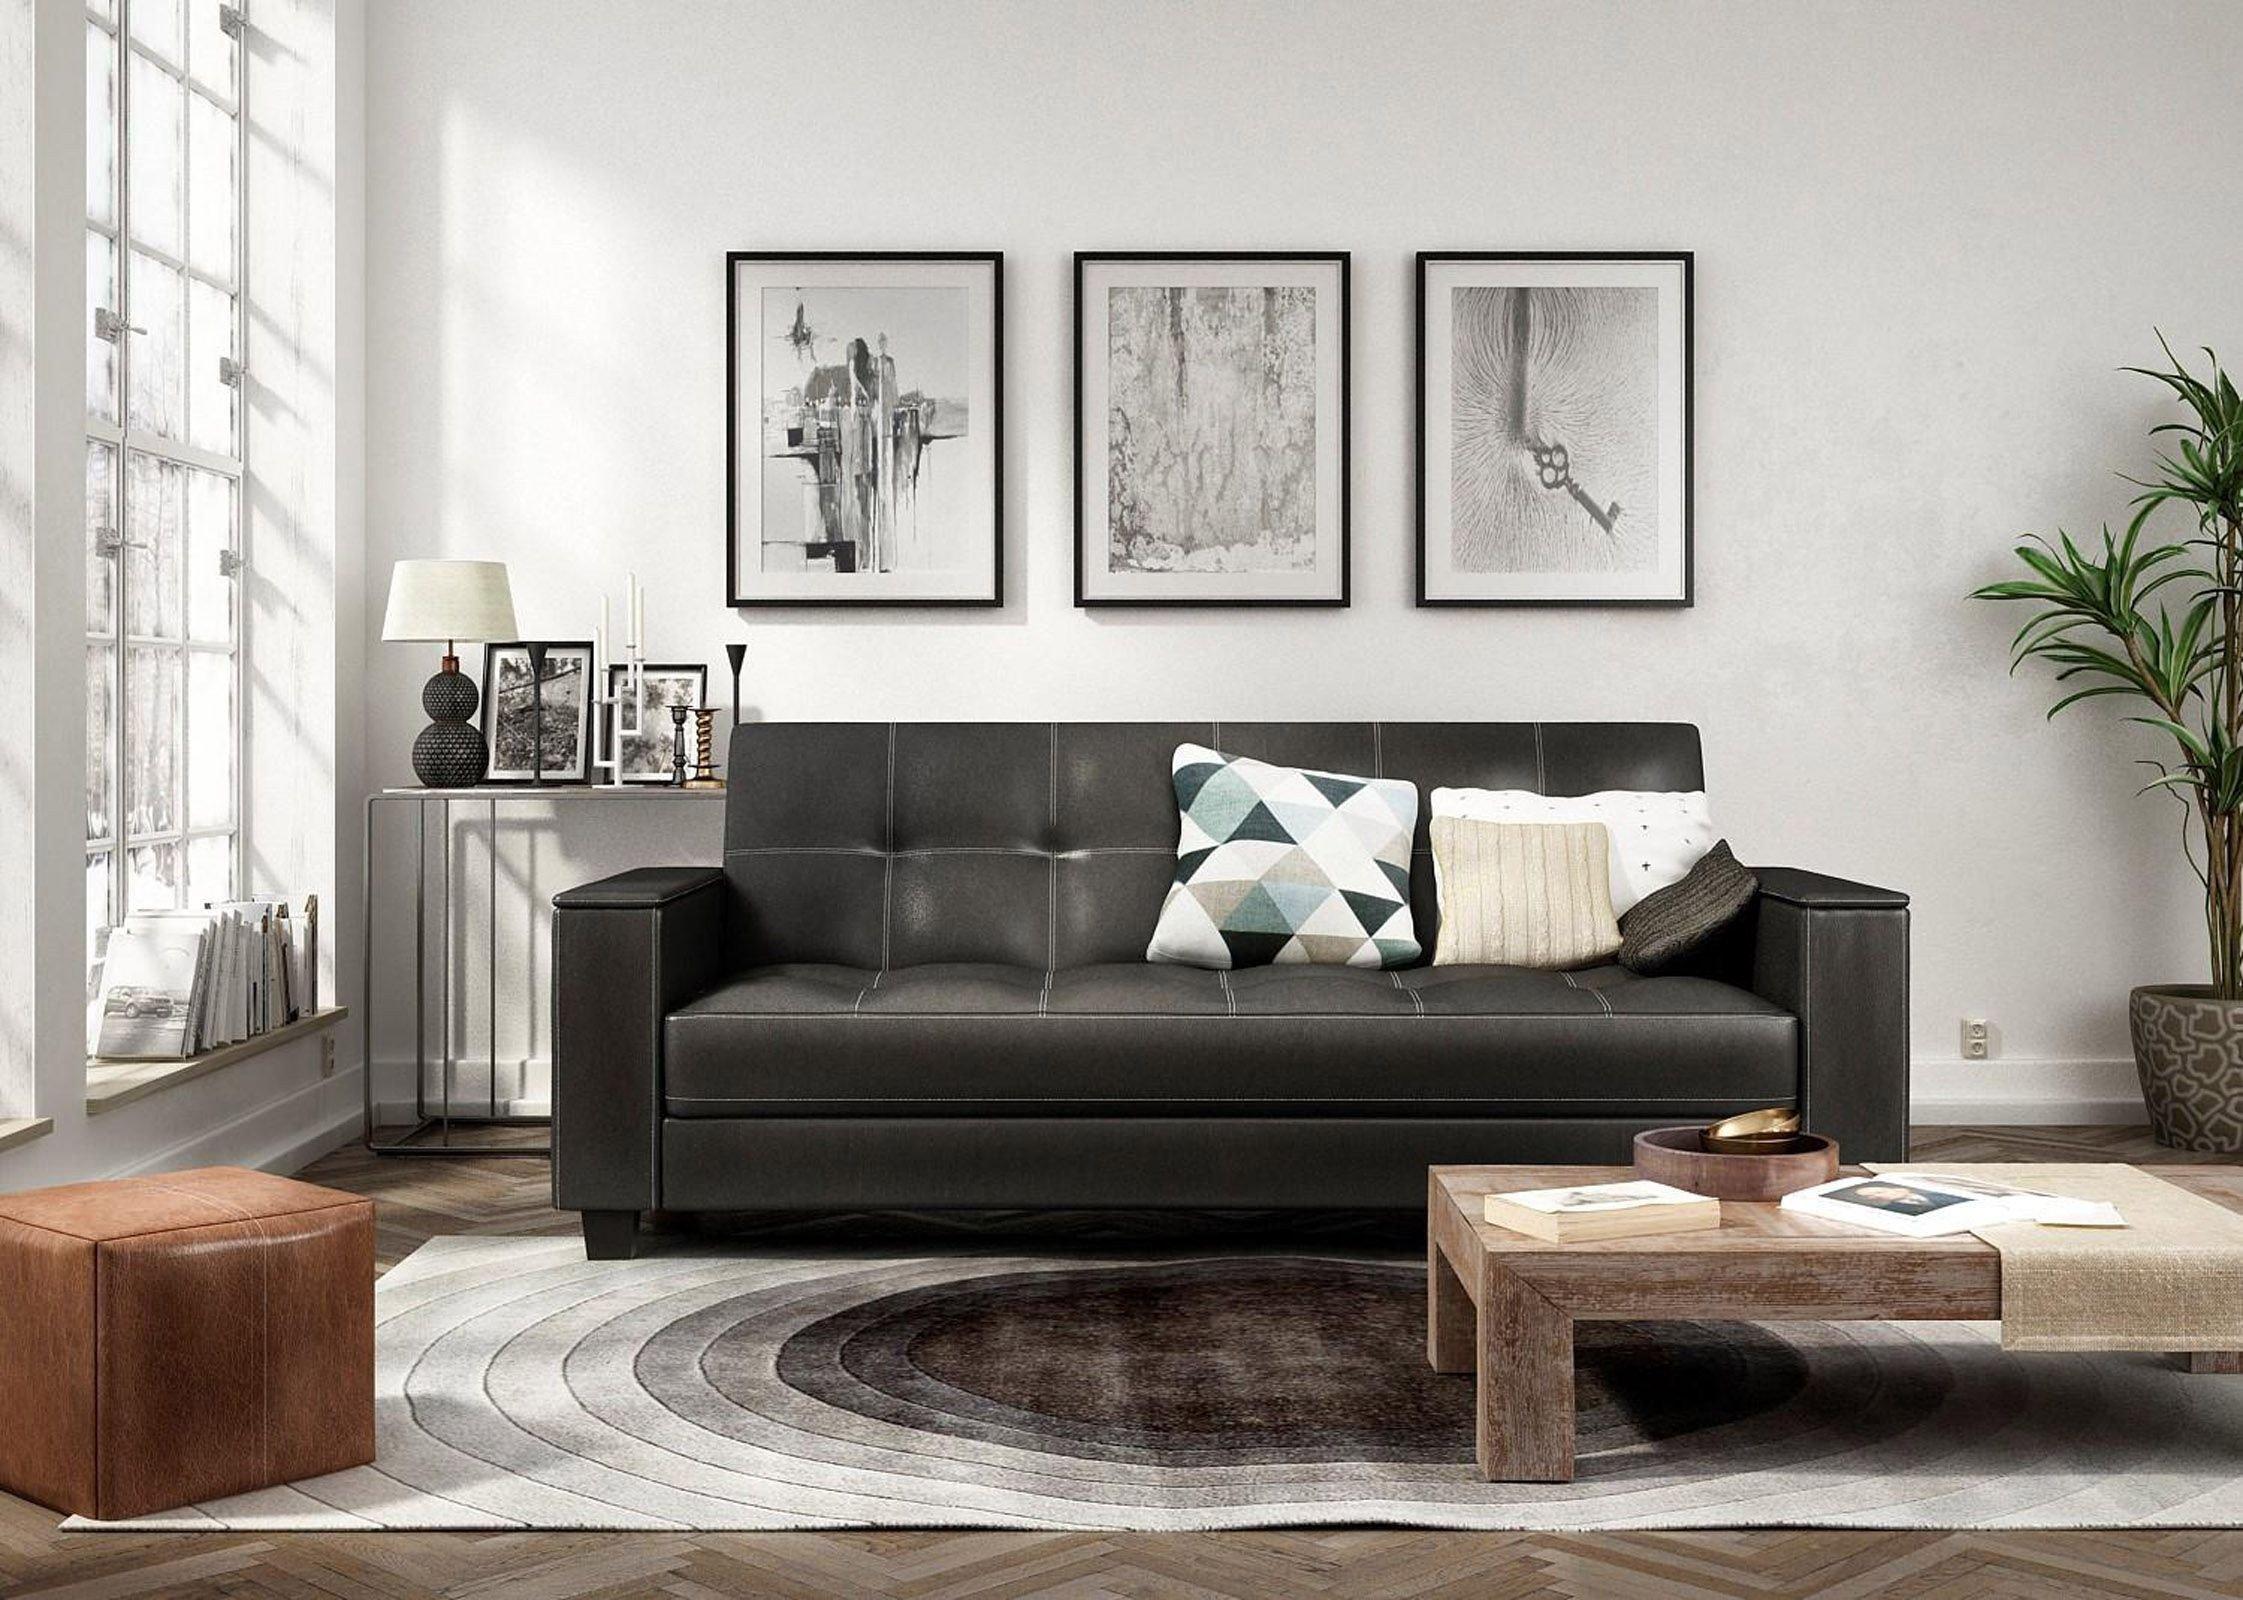 Sears Furniture Bedroom Set Luxury Sears Line Bed Sets